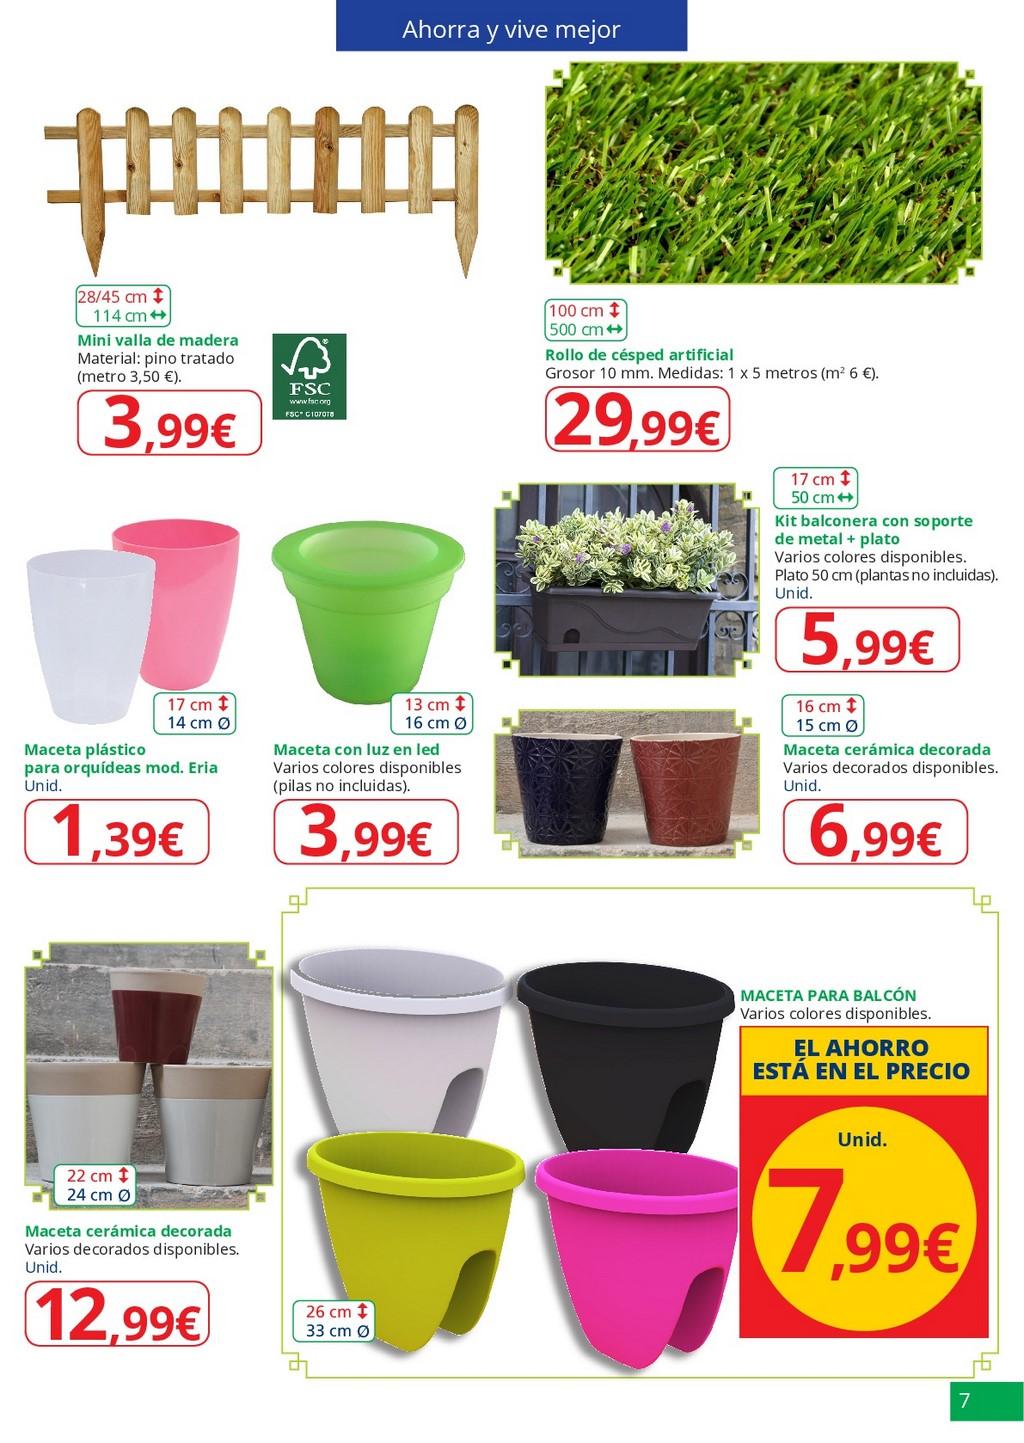 Especial jardin7 for Jardin alcampo 2016